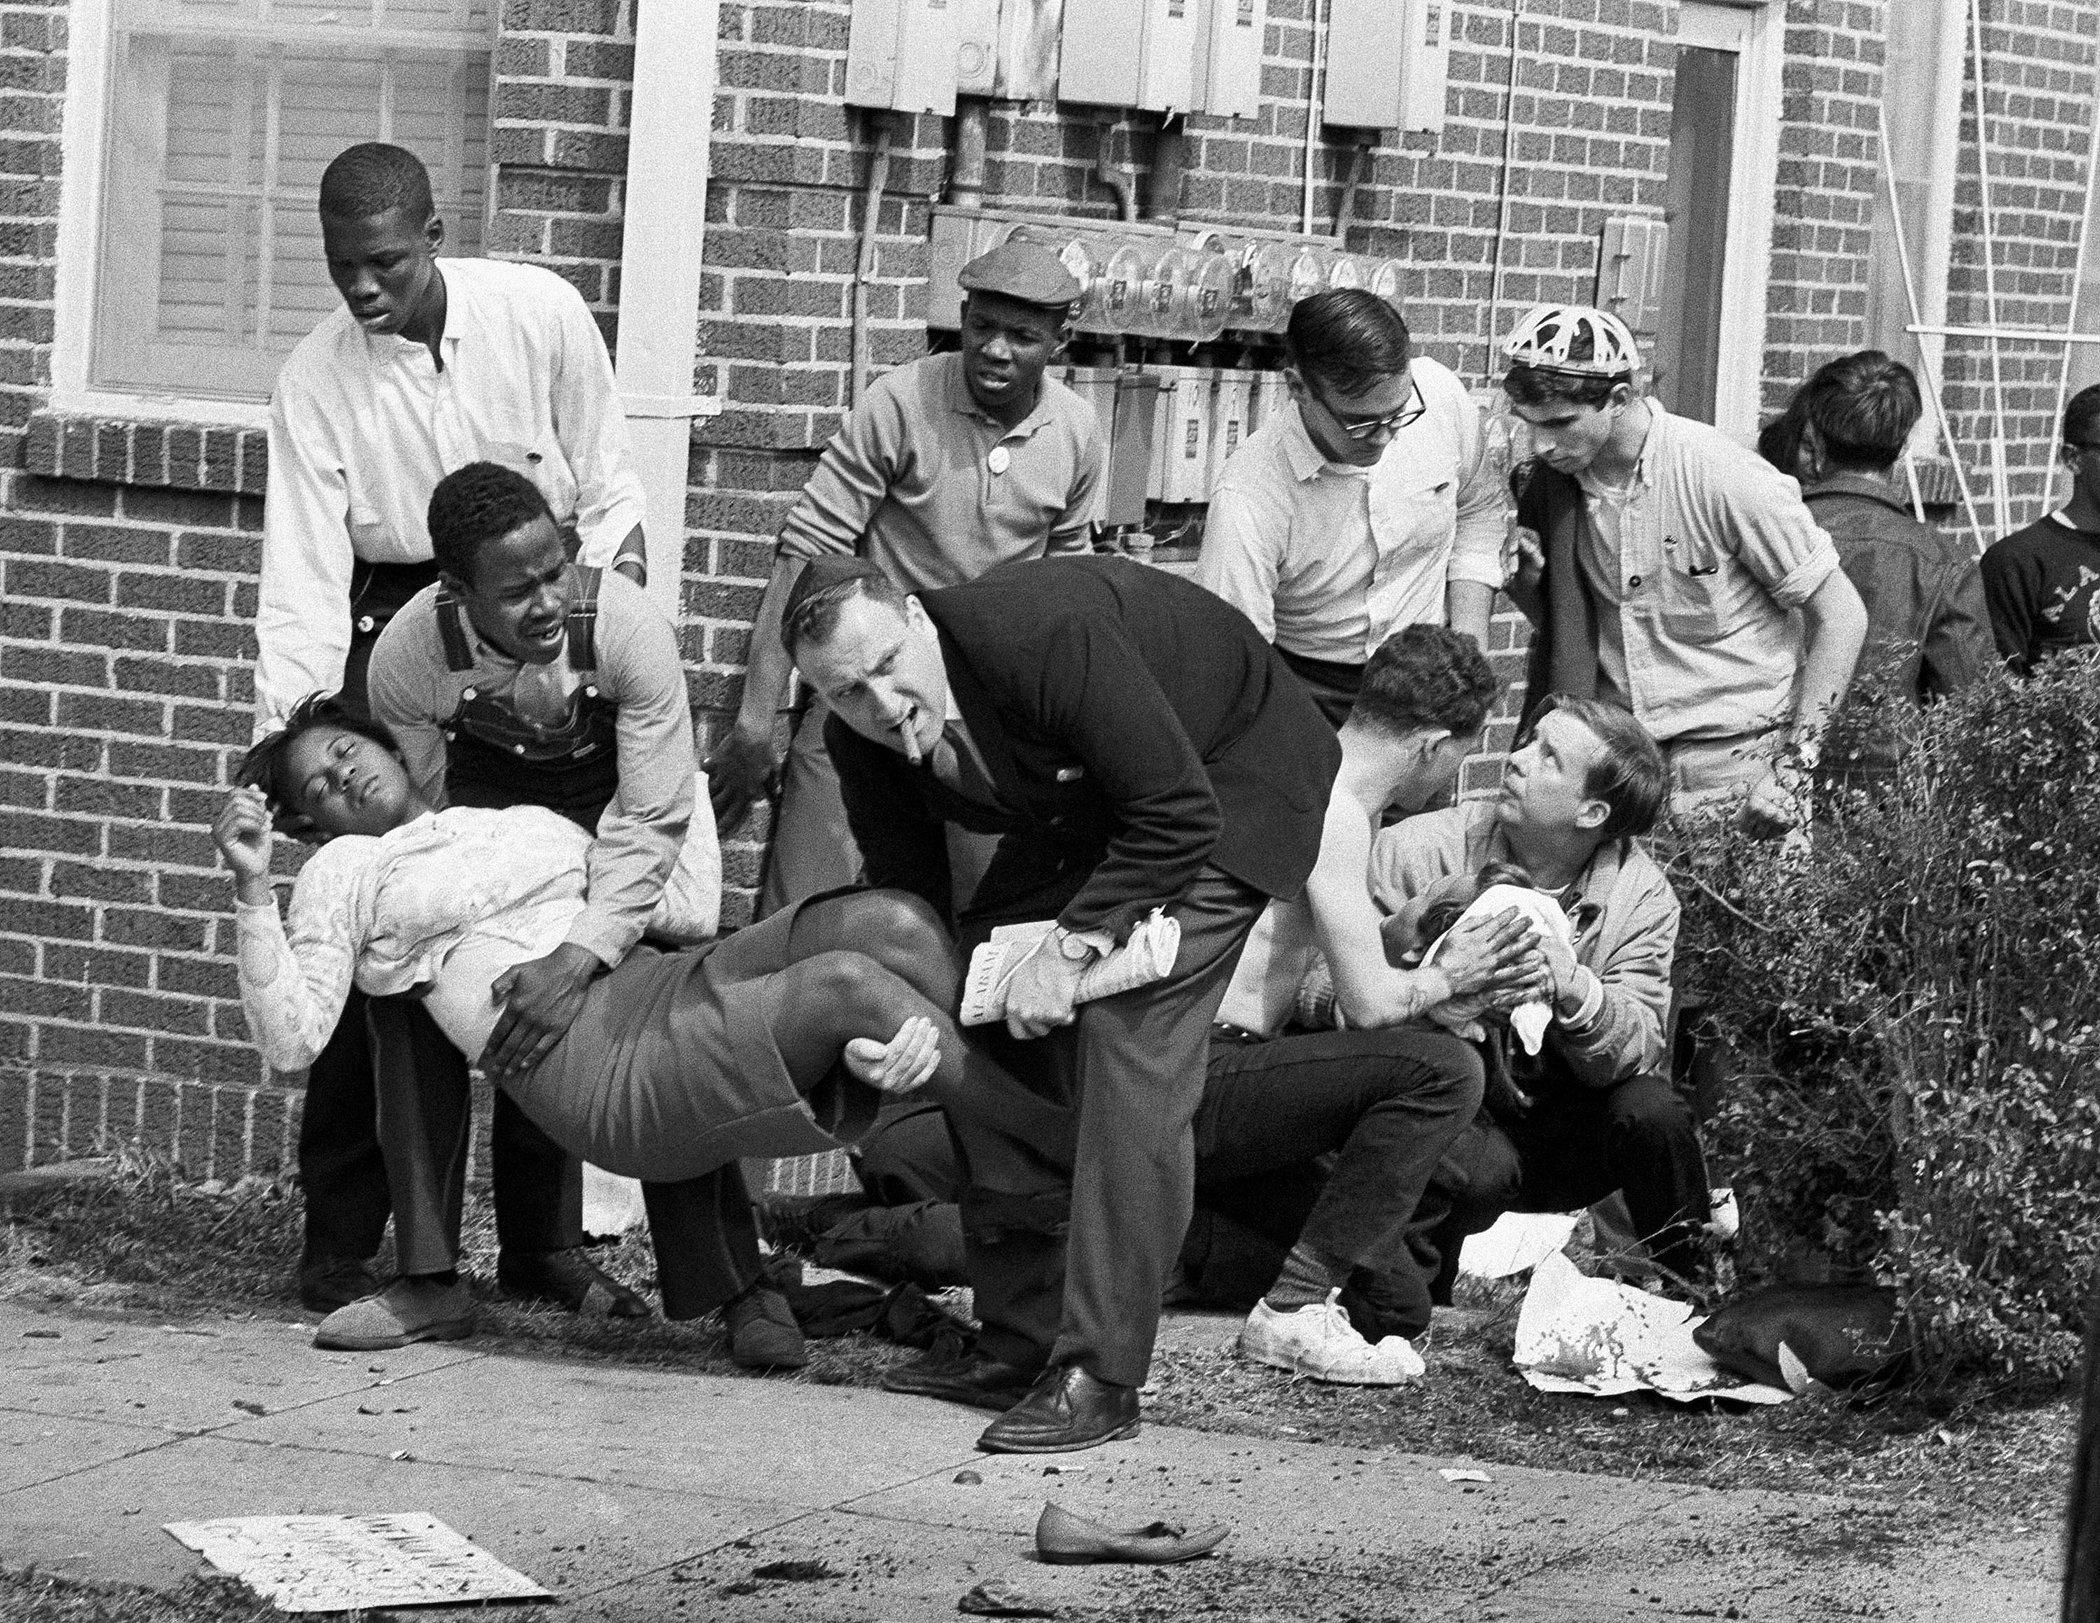 Amelia-Boynton-Selma-Black-History-Month.jpg